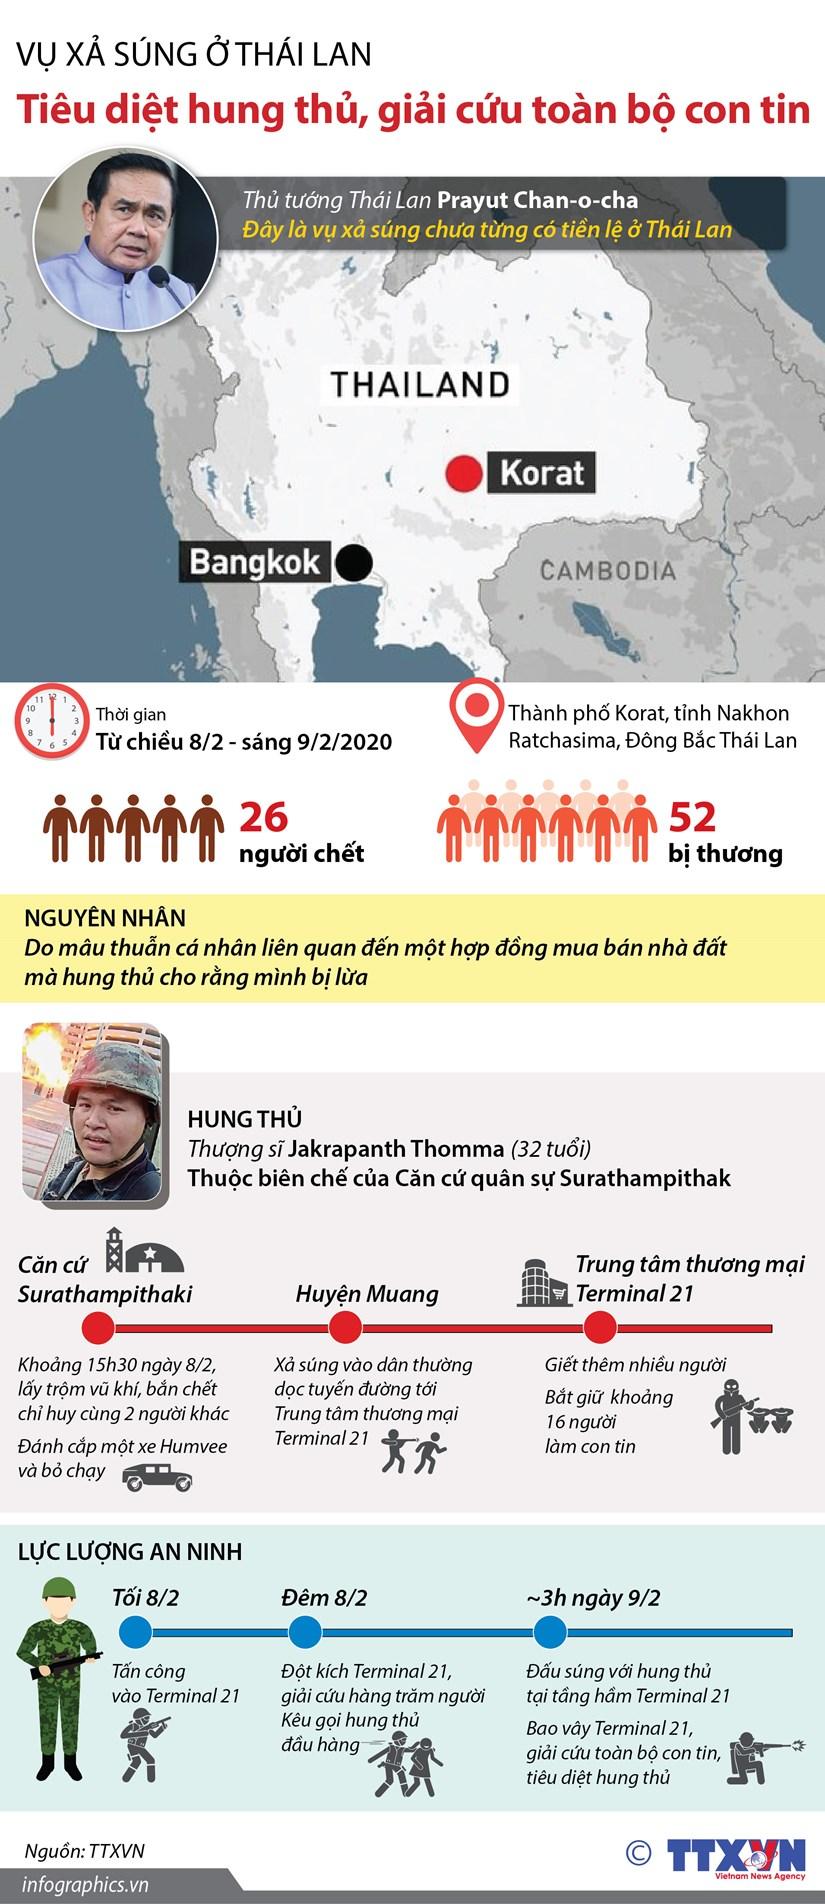 [Infographics] Nhin lai vu xa sung khien 26 nguoi chet o Thai Lan hinh anh 1